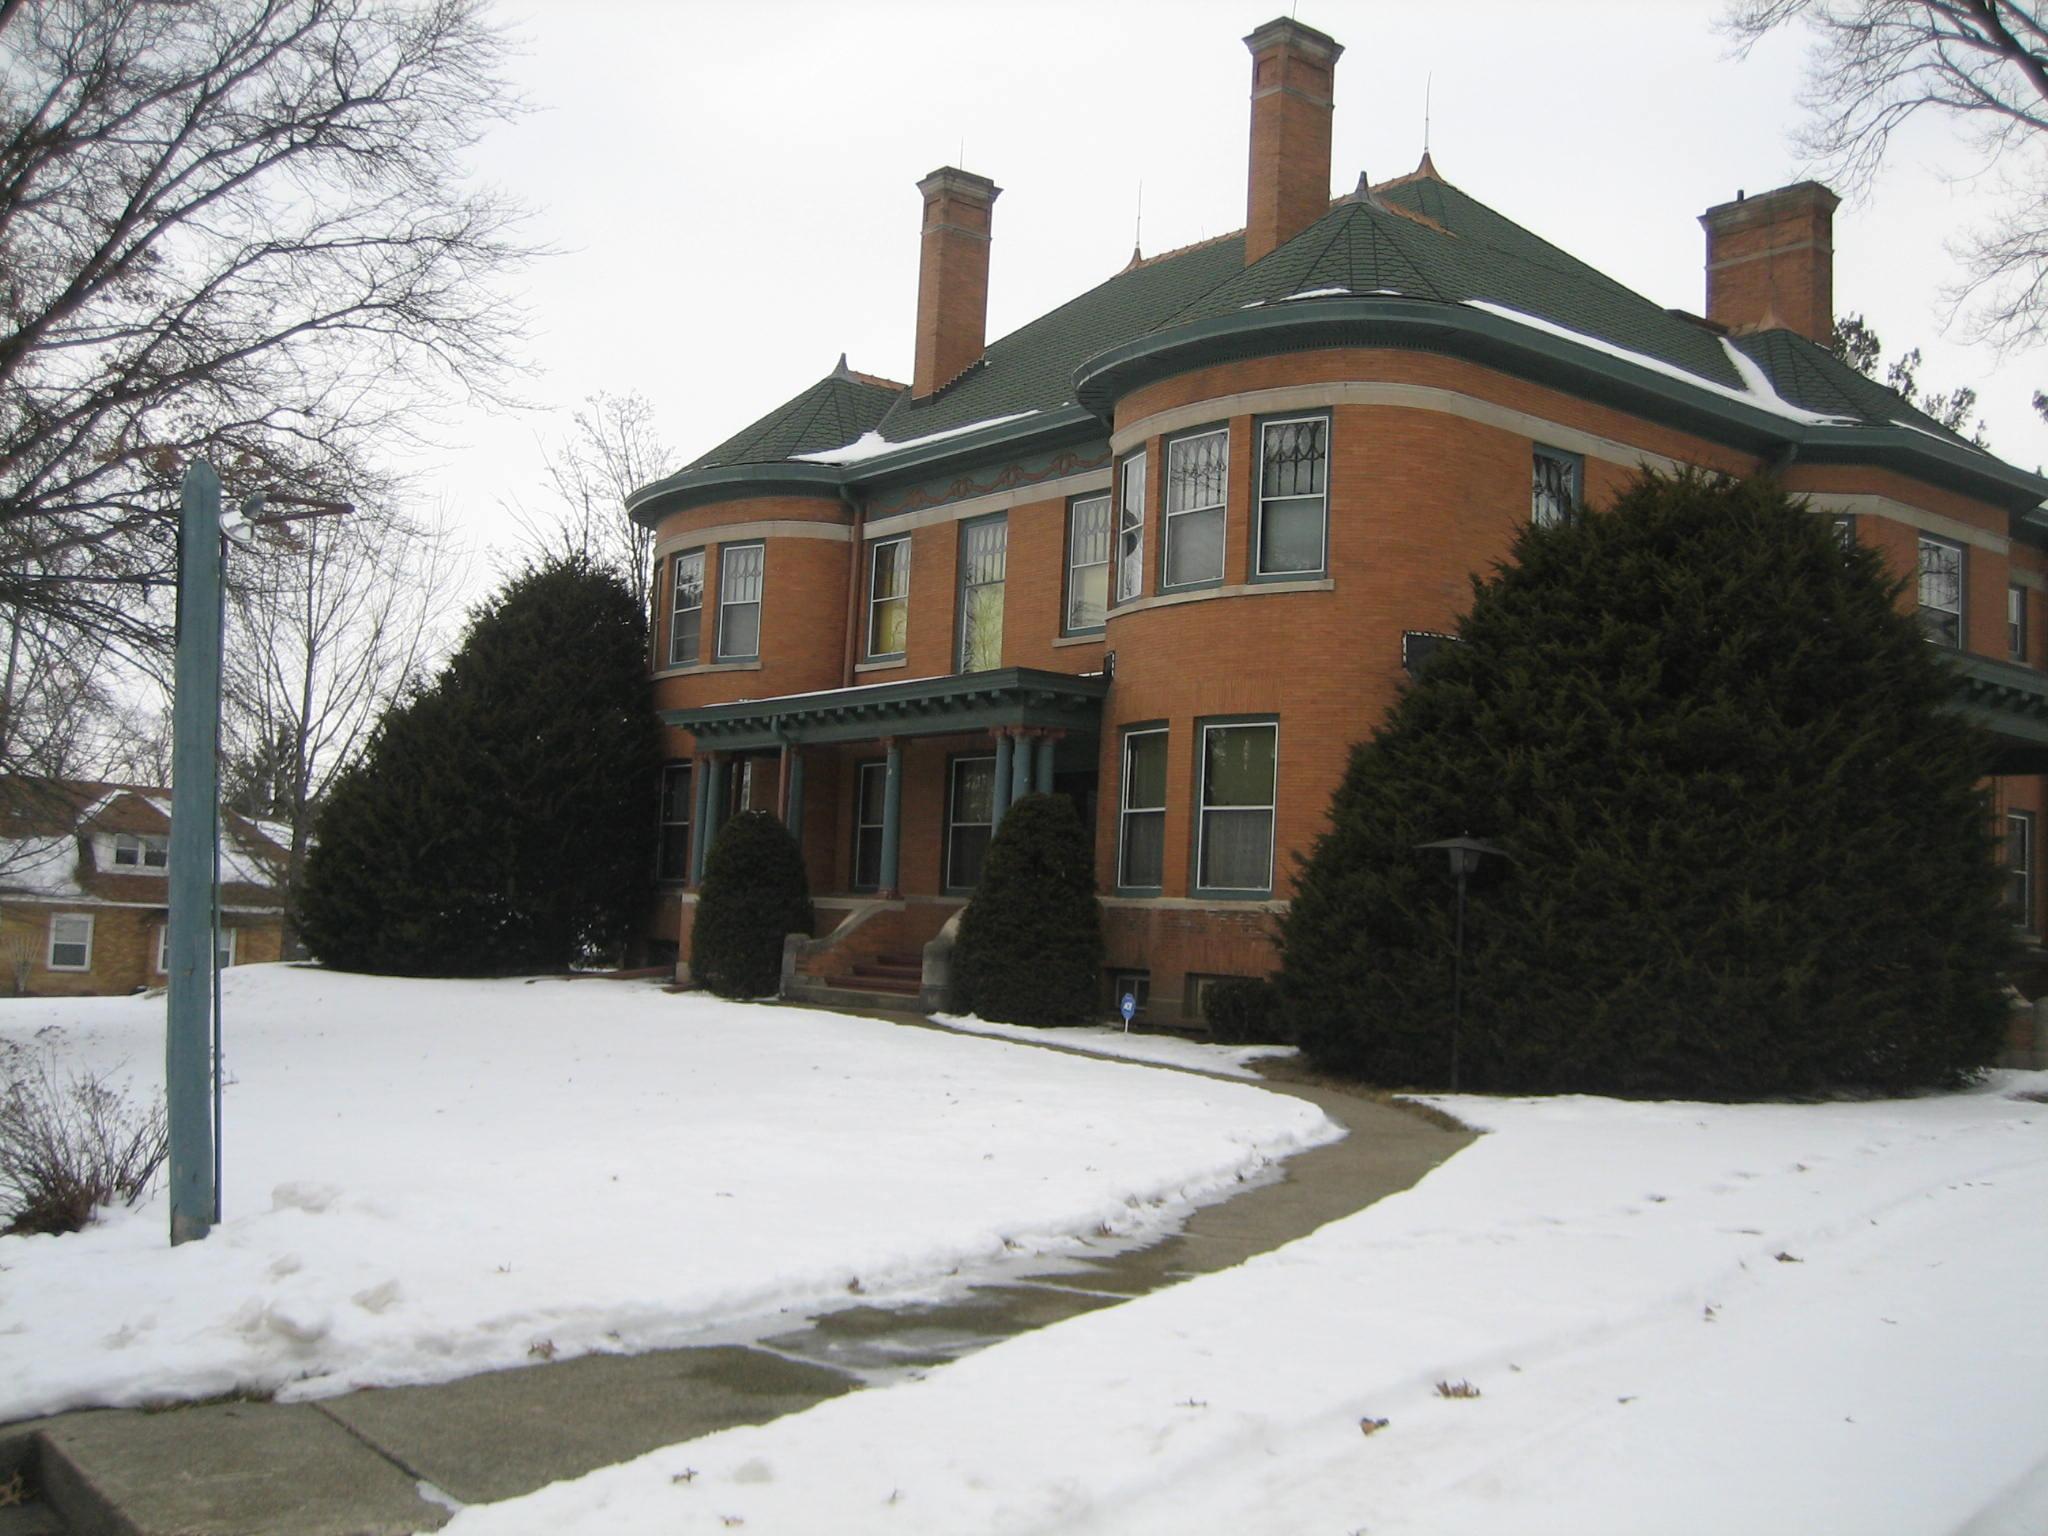 Illinois ogle county polo - File Ogle County Polo Il H D Barber House3 Jpg